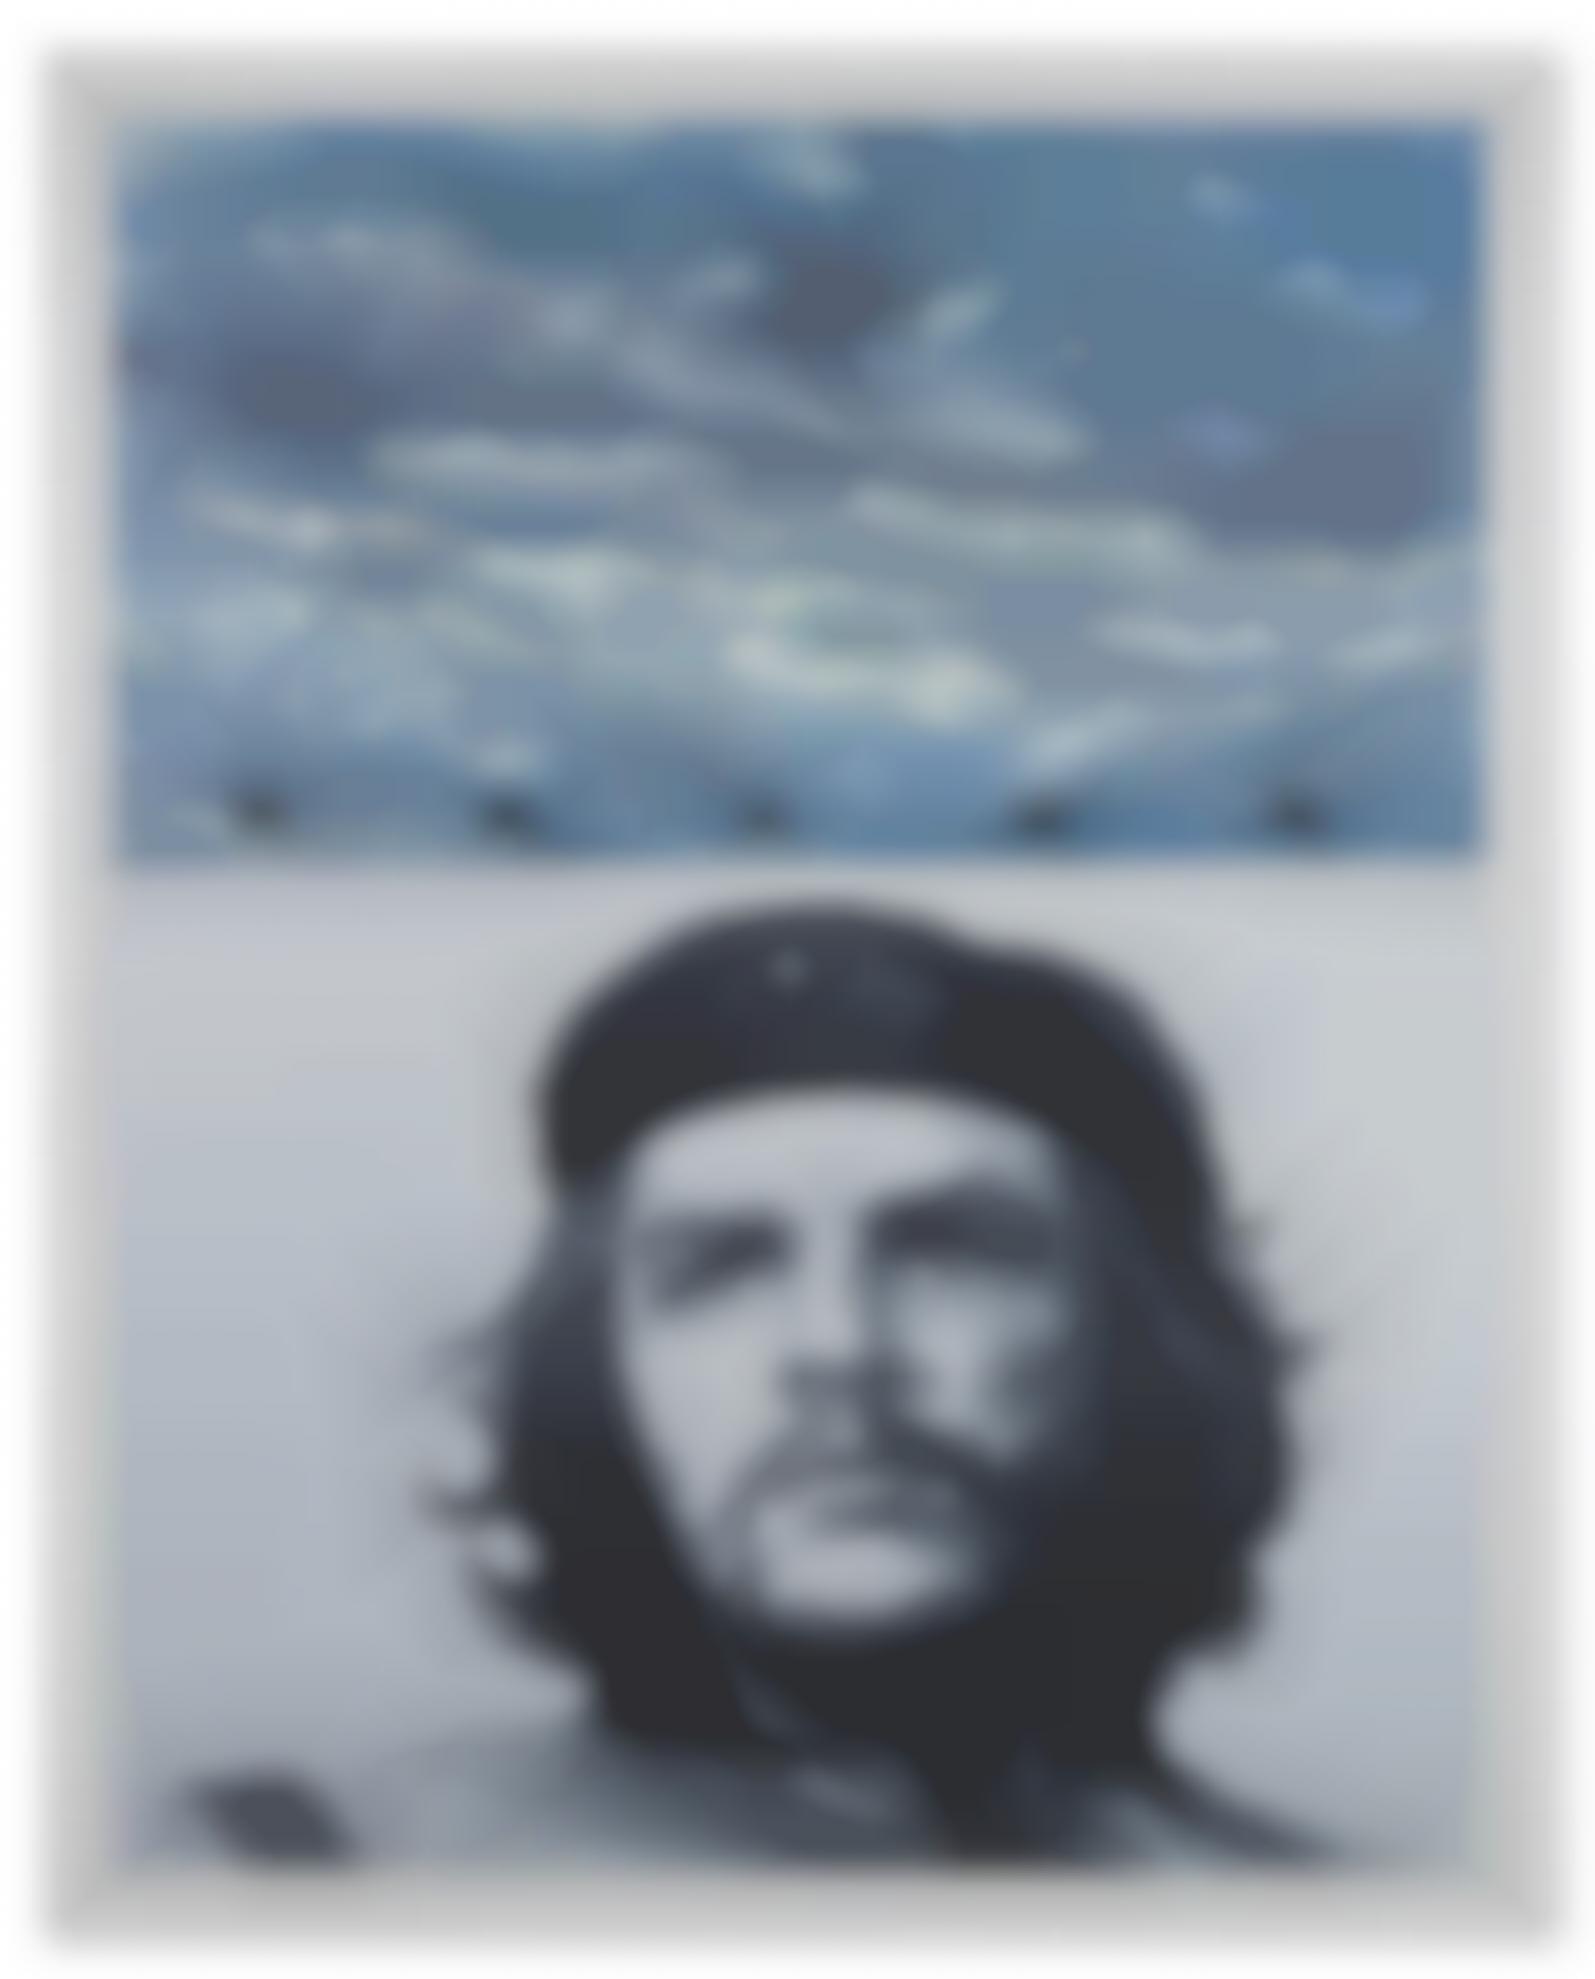 Shi Xinning-Che (Che Guevara)-2004